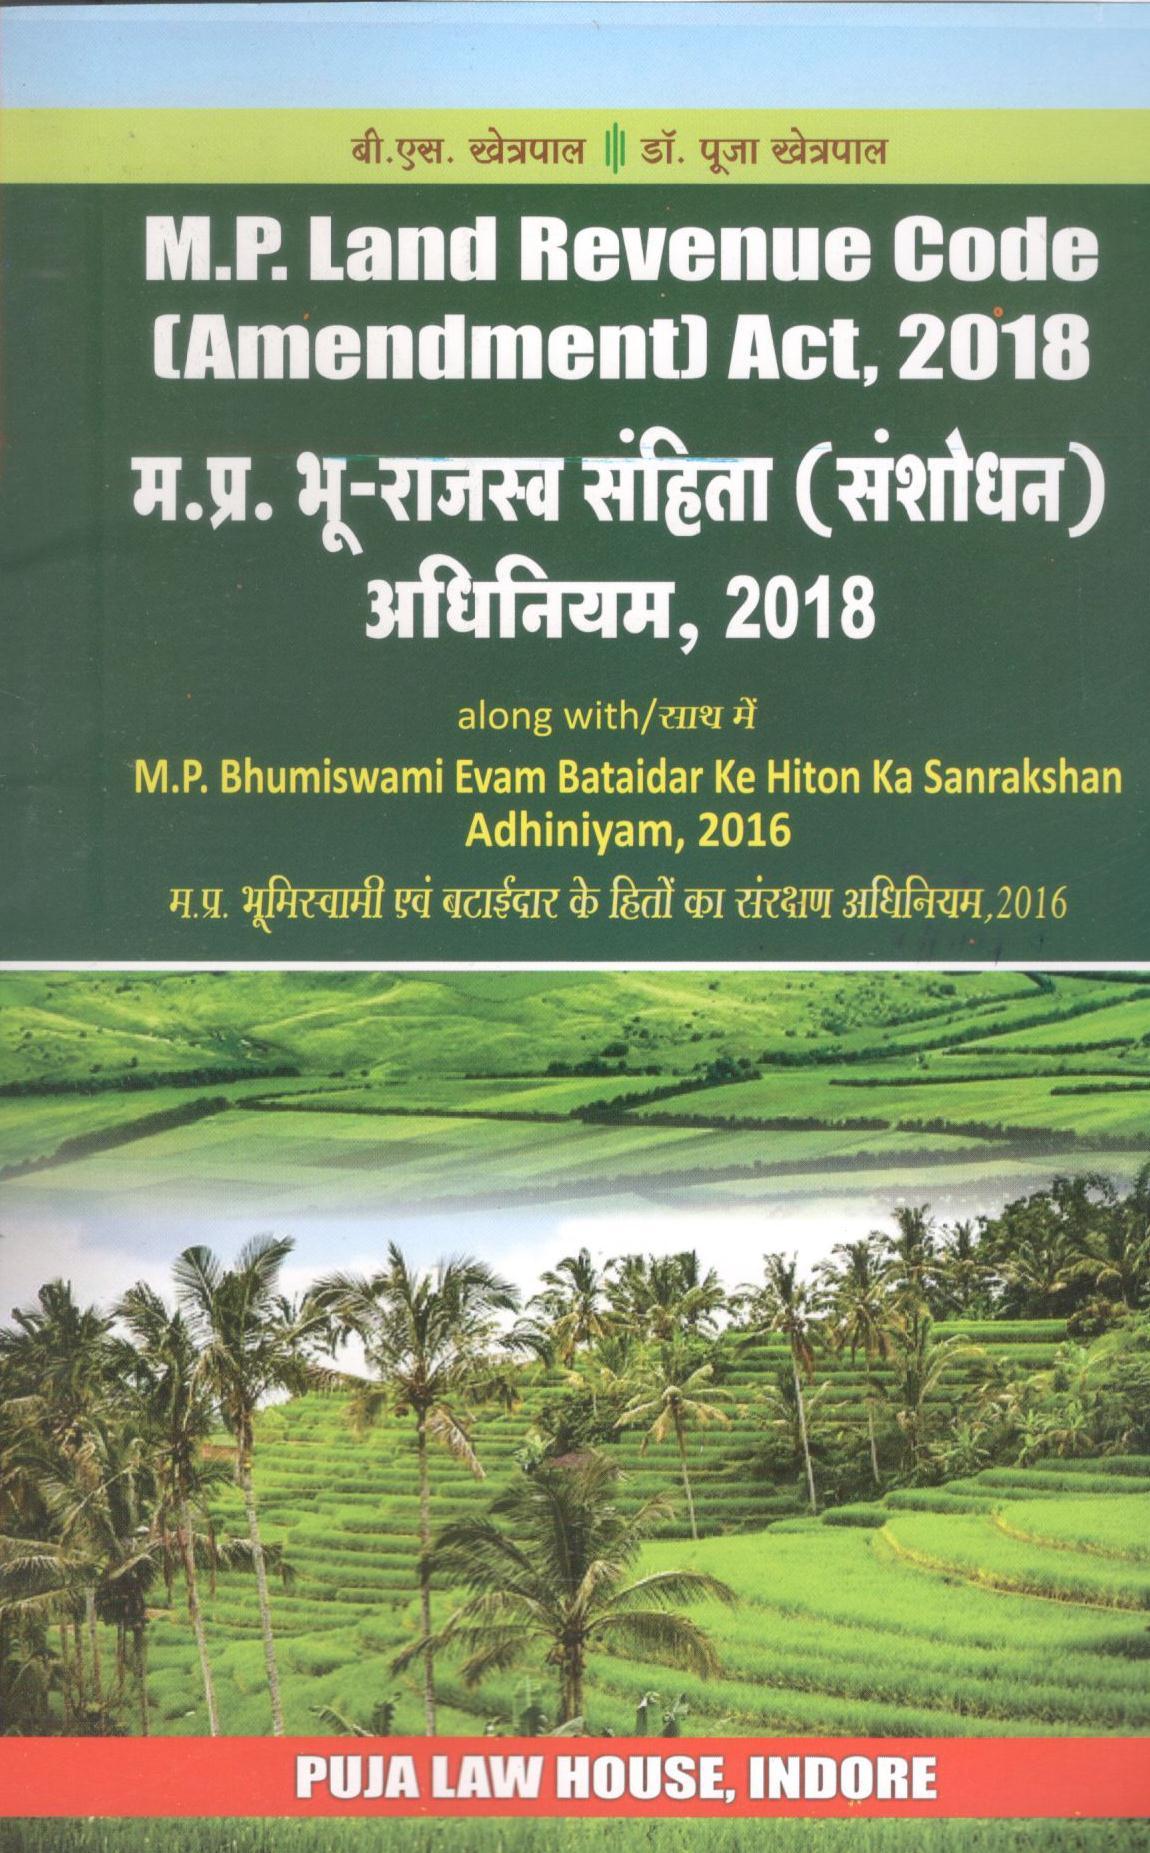 मध्य प्रदेश भूमि राजस्व संहिता (संशोधन)  अधिनियम, 2018 / Madhya Pradesh Land revenue Code (amendment) Act, 2018